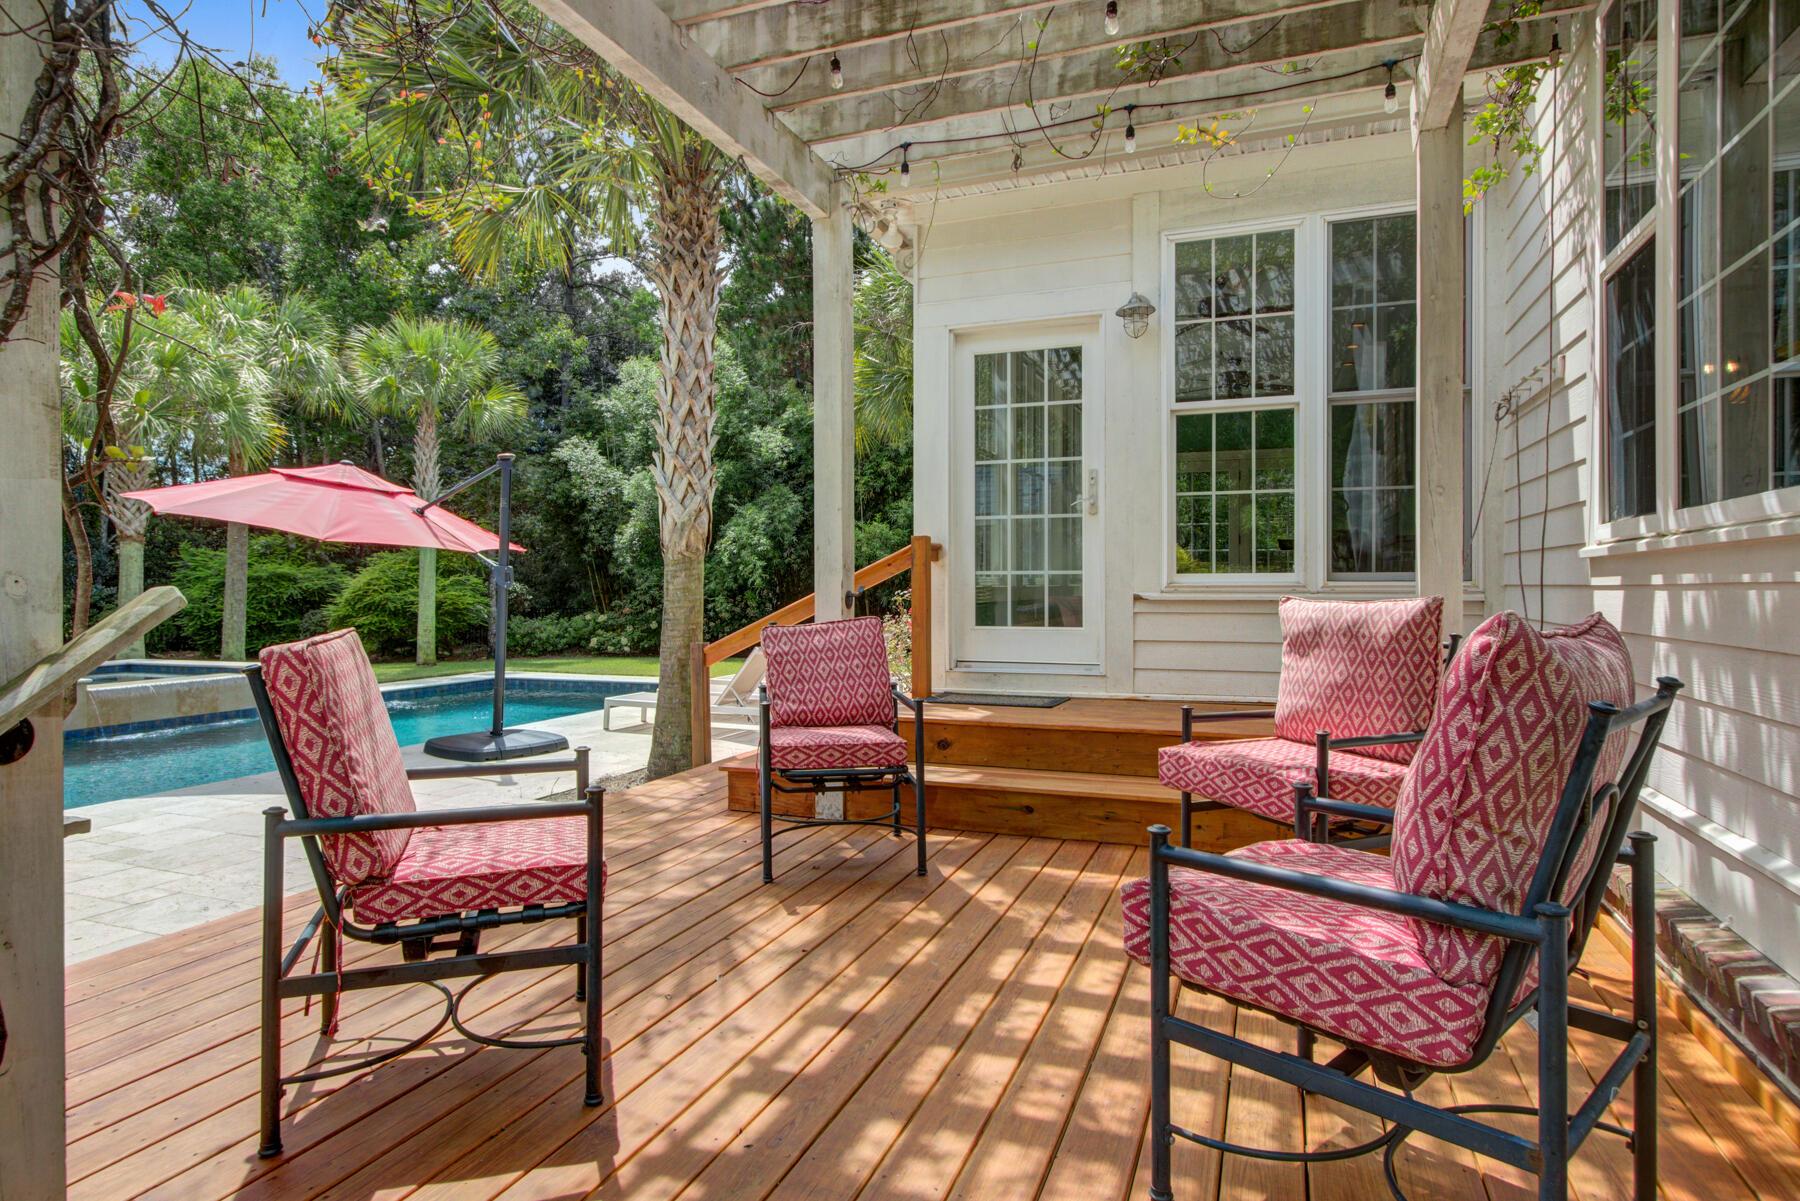 Dunes West Homes For Sale - 3095 Pignatelli, Mount Pleasant, SC - 48